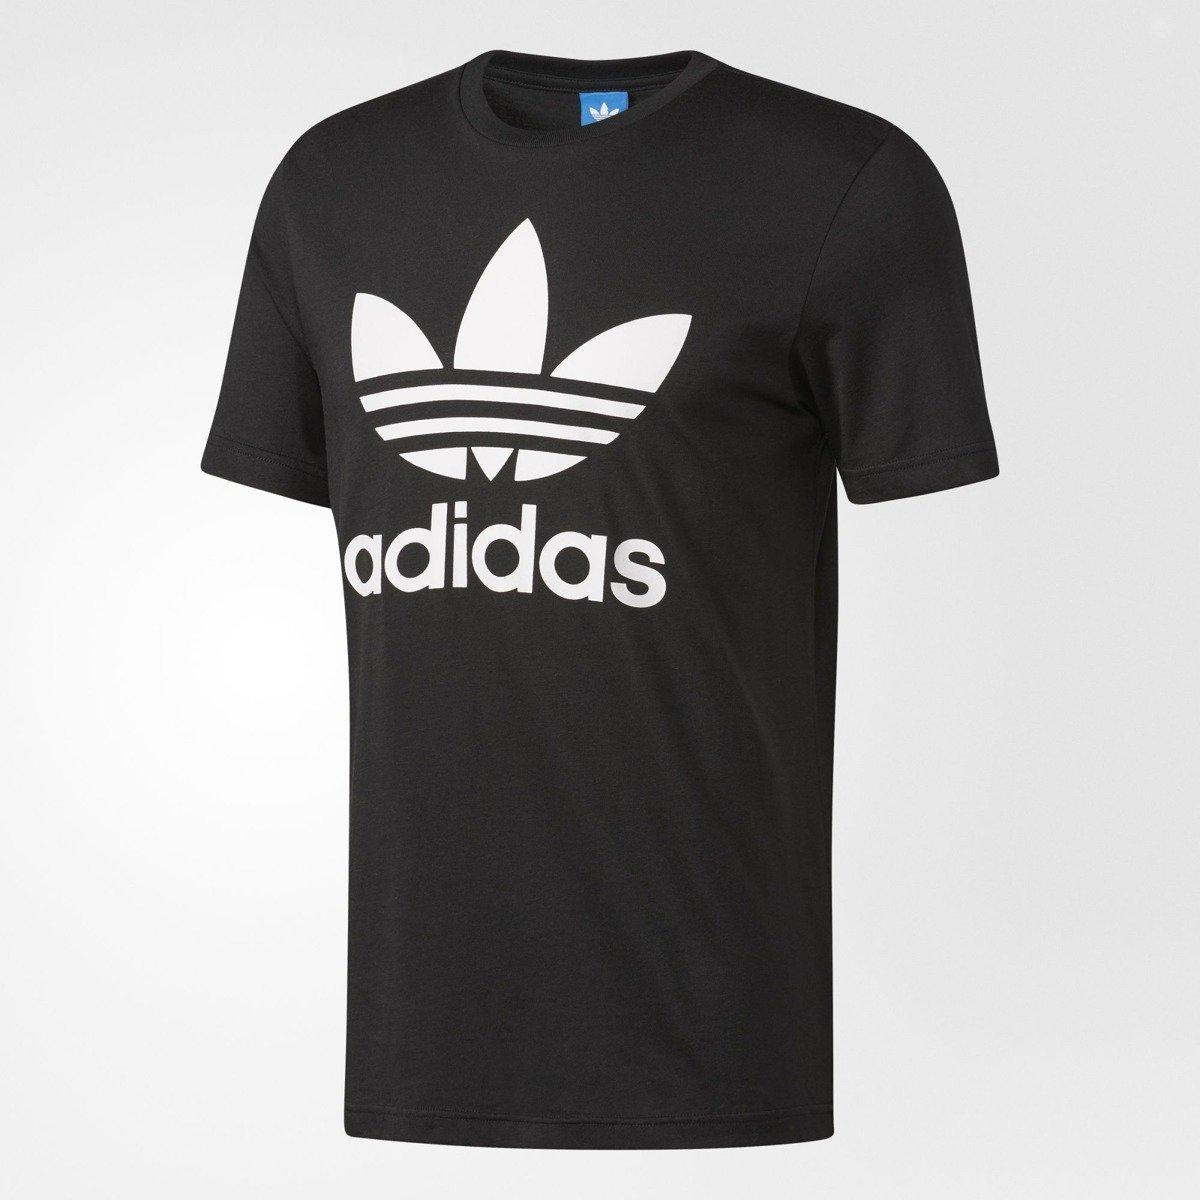 Adidas originals trefoil t shirt aj8830 basketball for Adidas custom t shirts